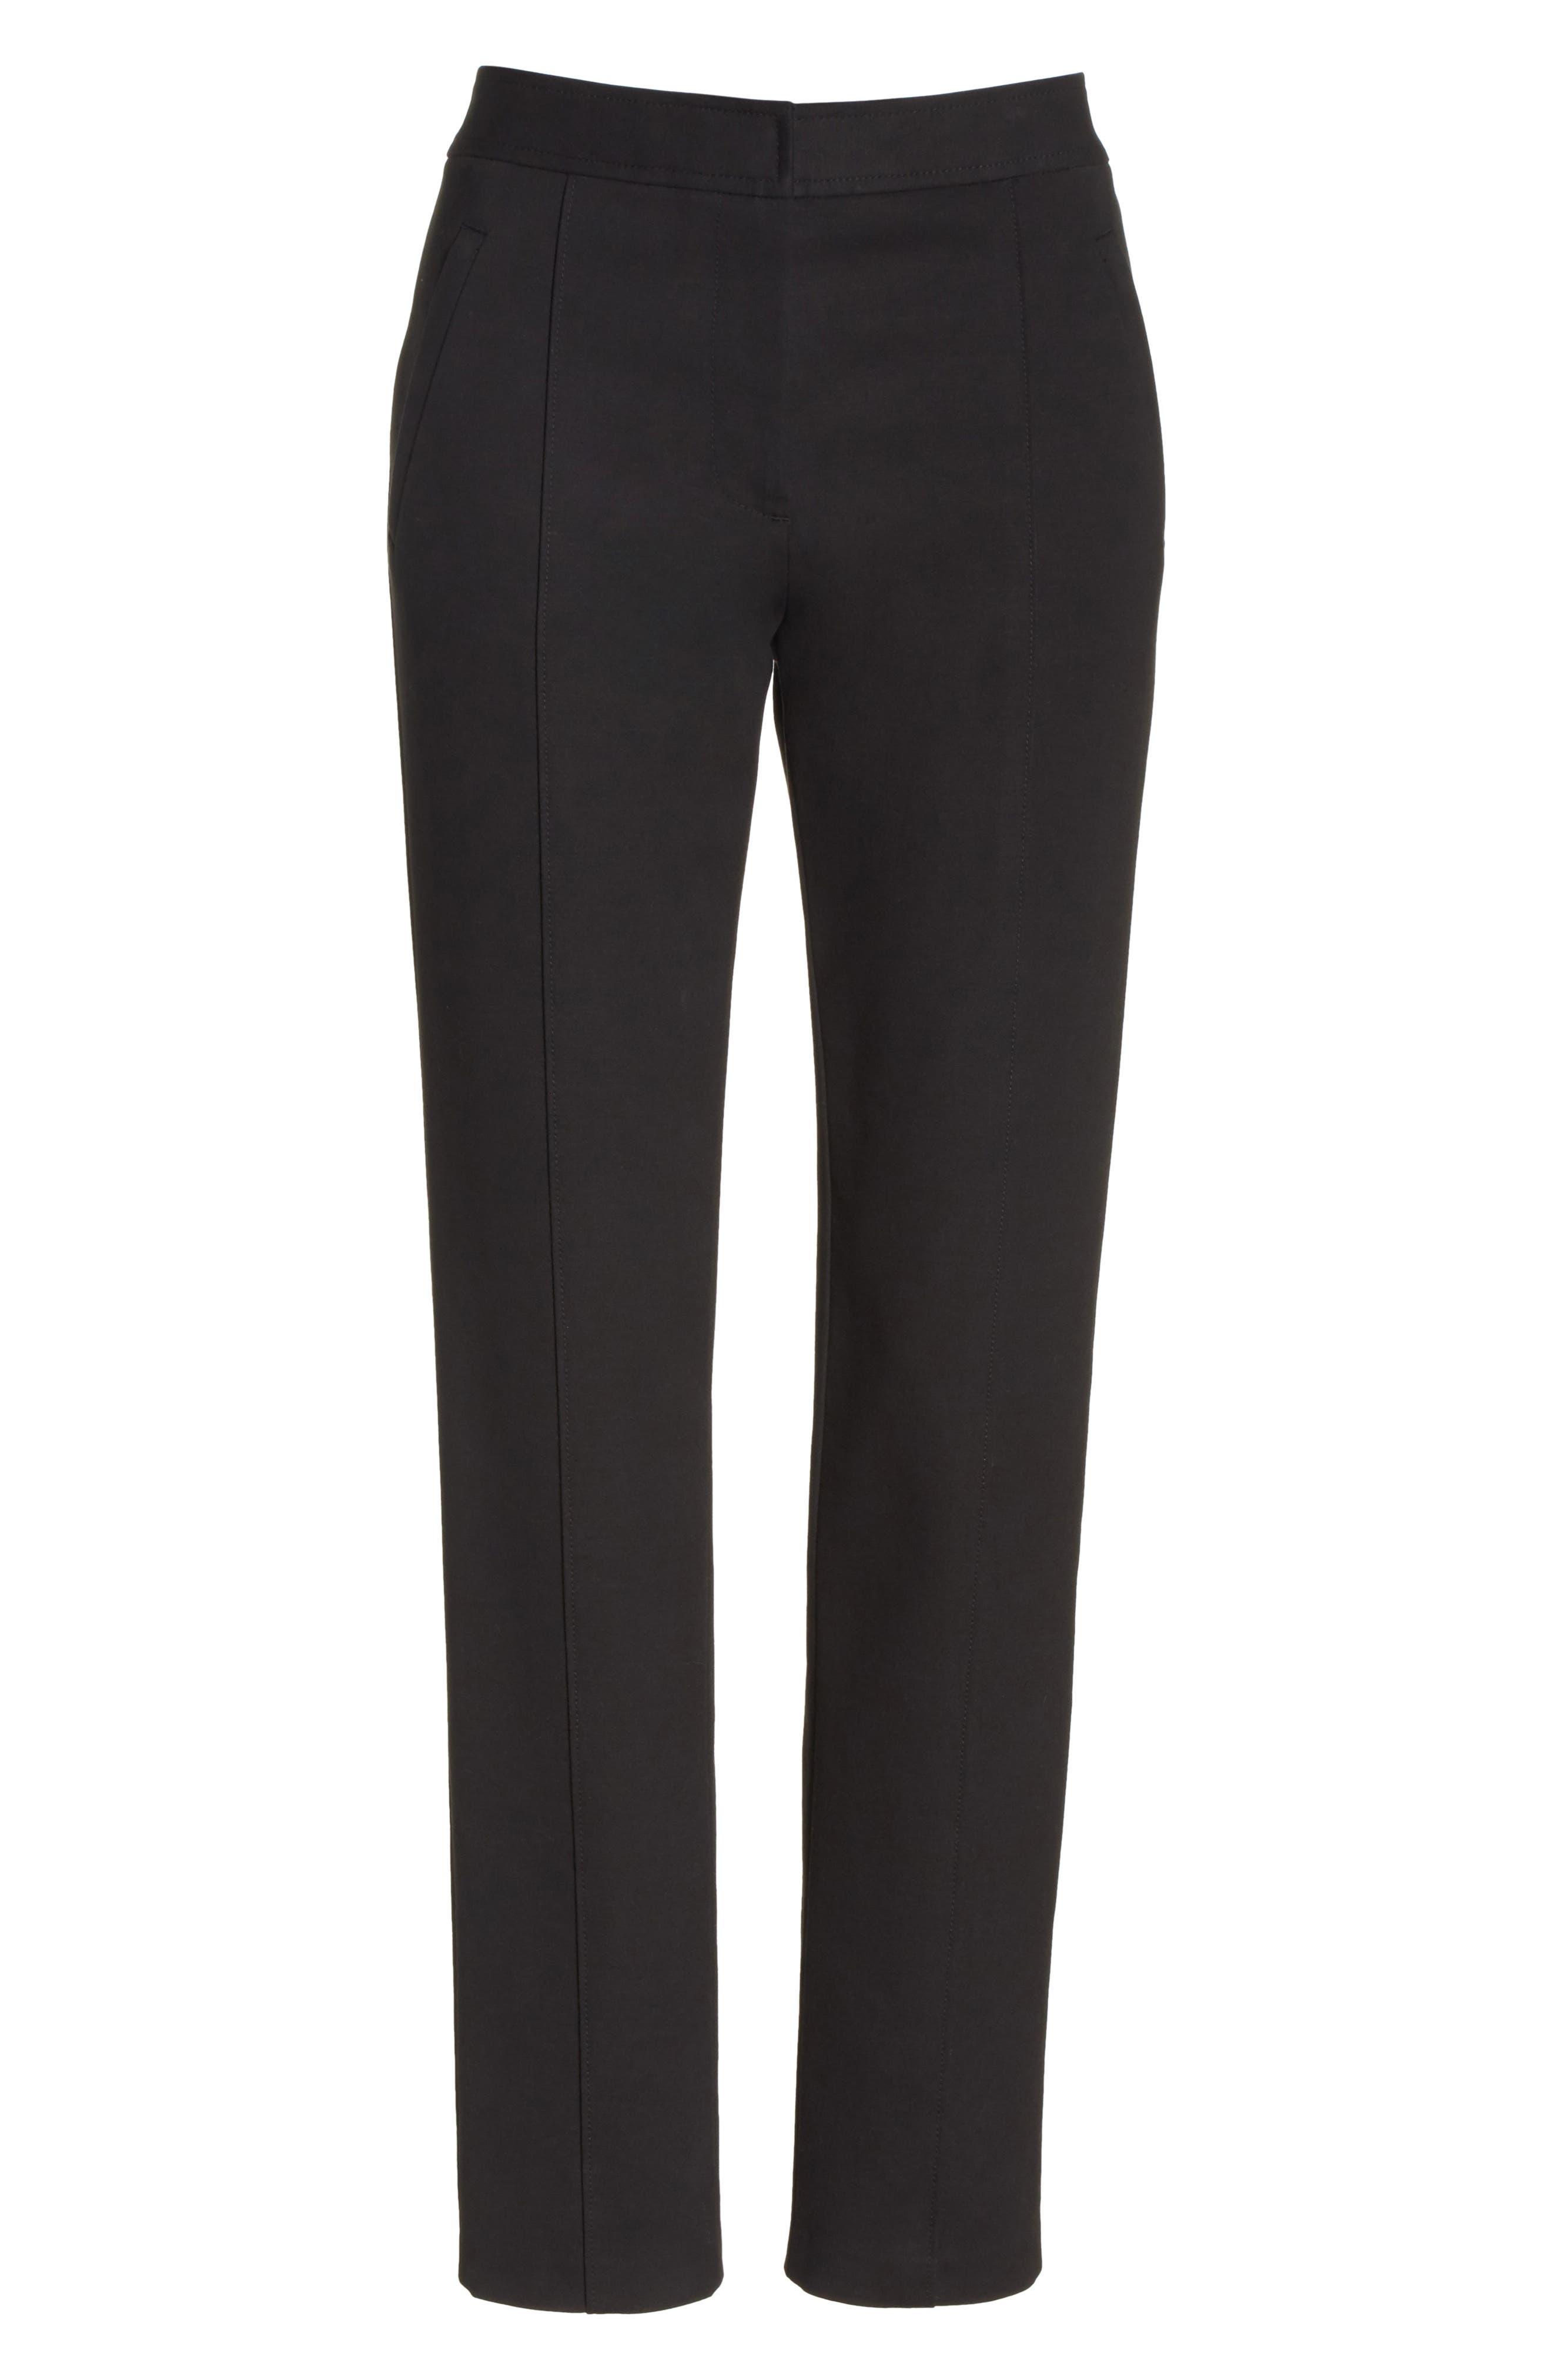 Vanner Slim Leg Ankle Pants,                             Alternate thumbnail 6, color,                             Black